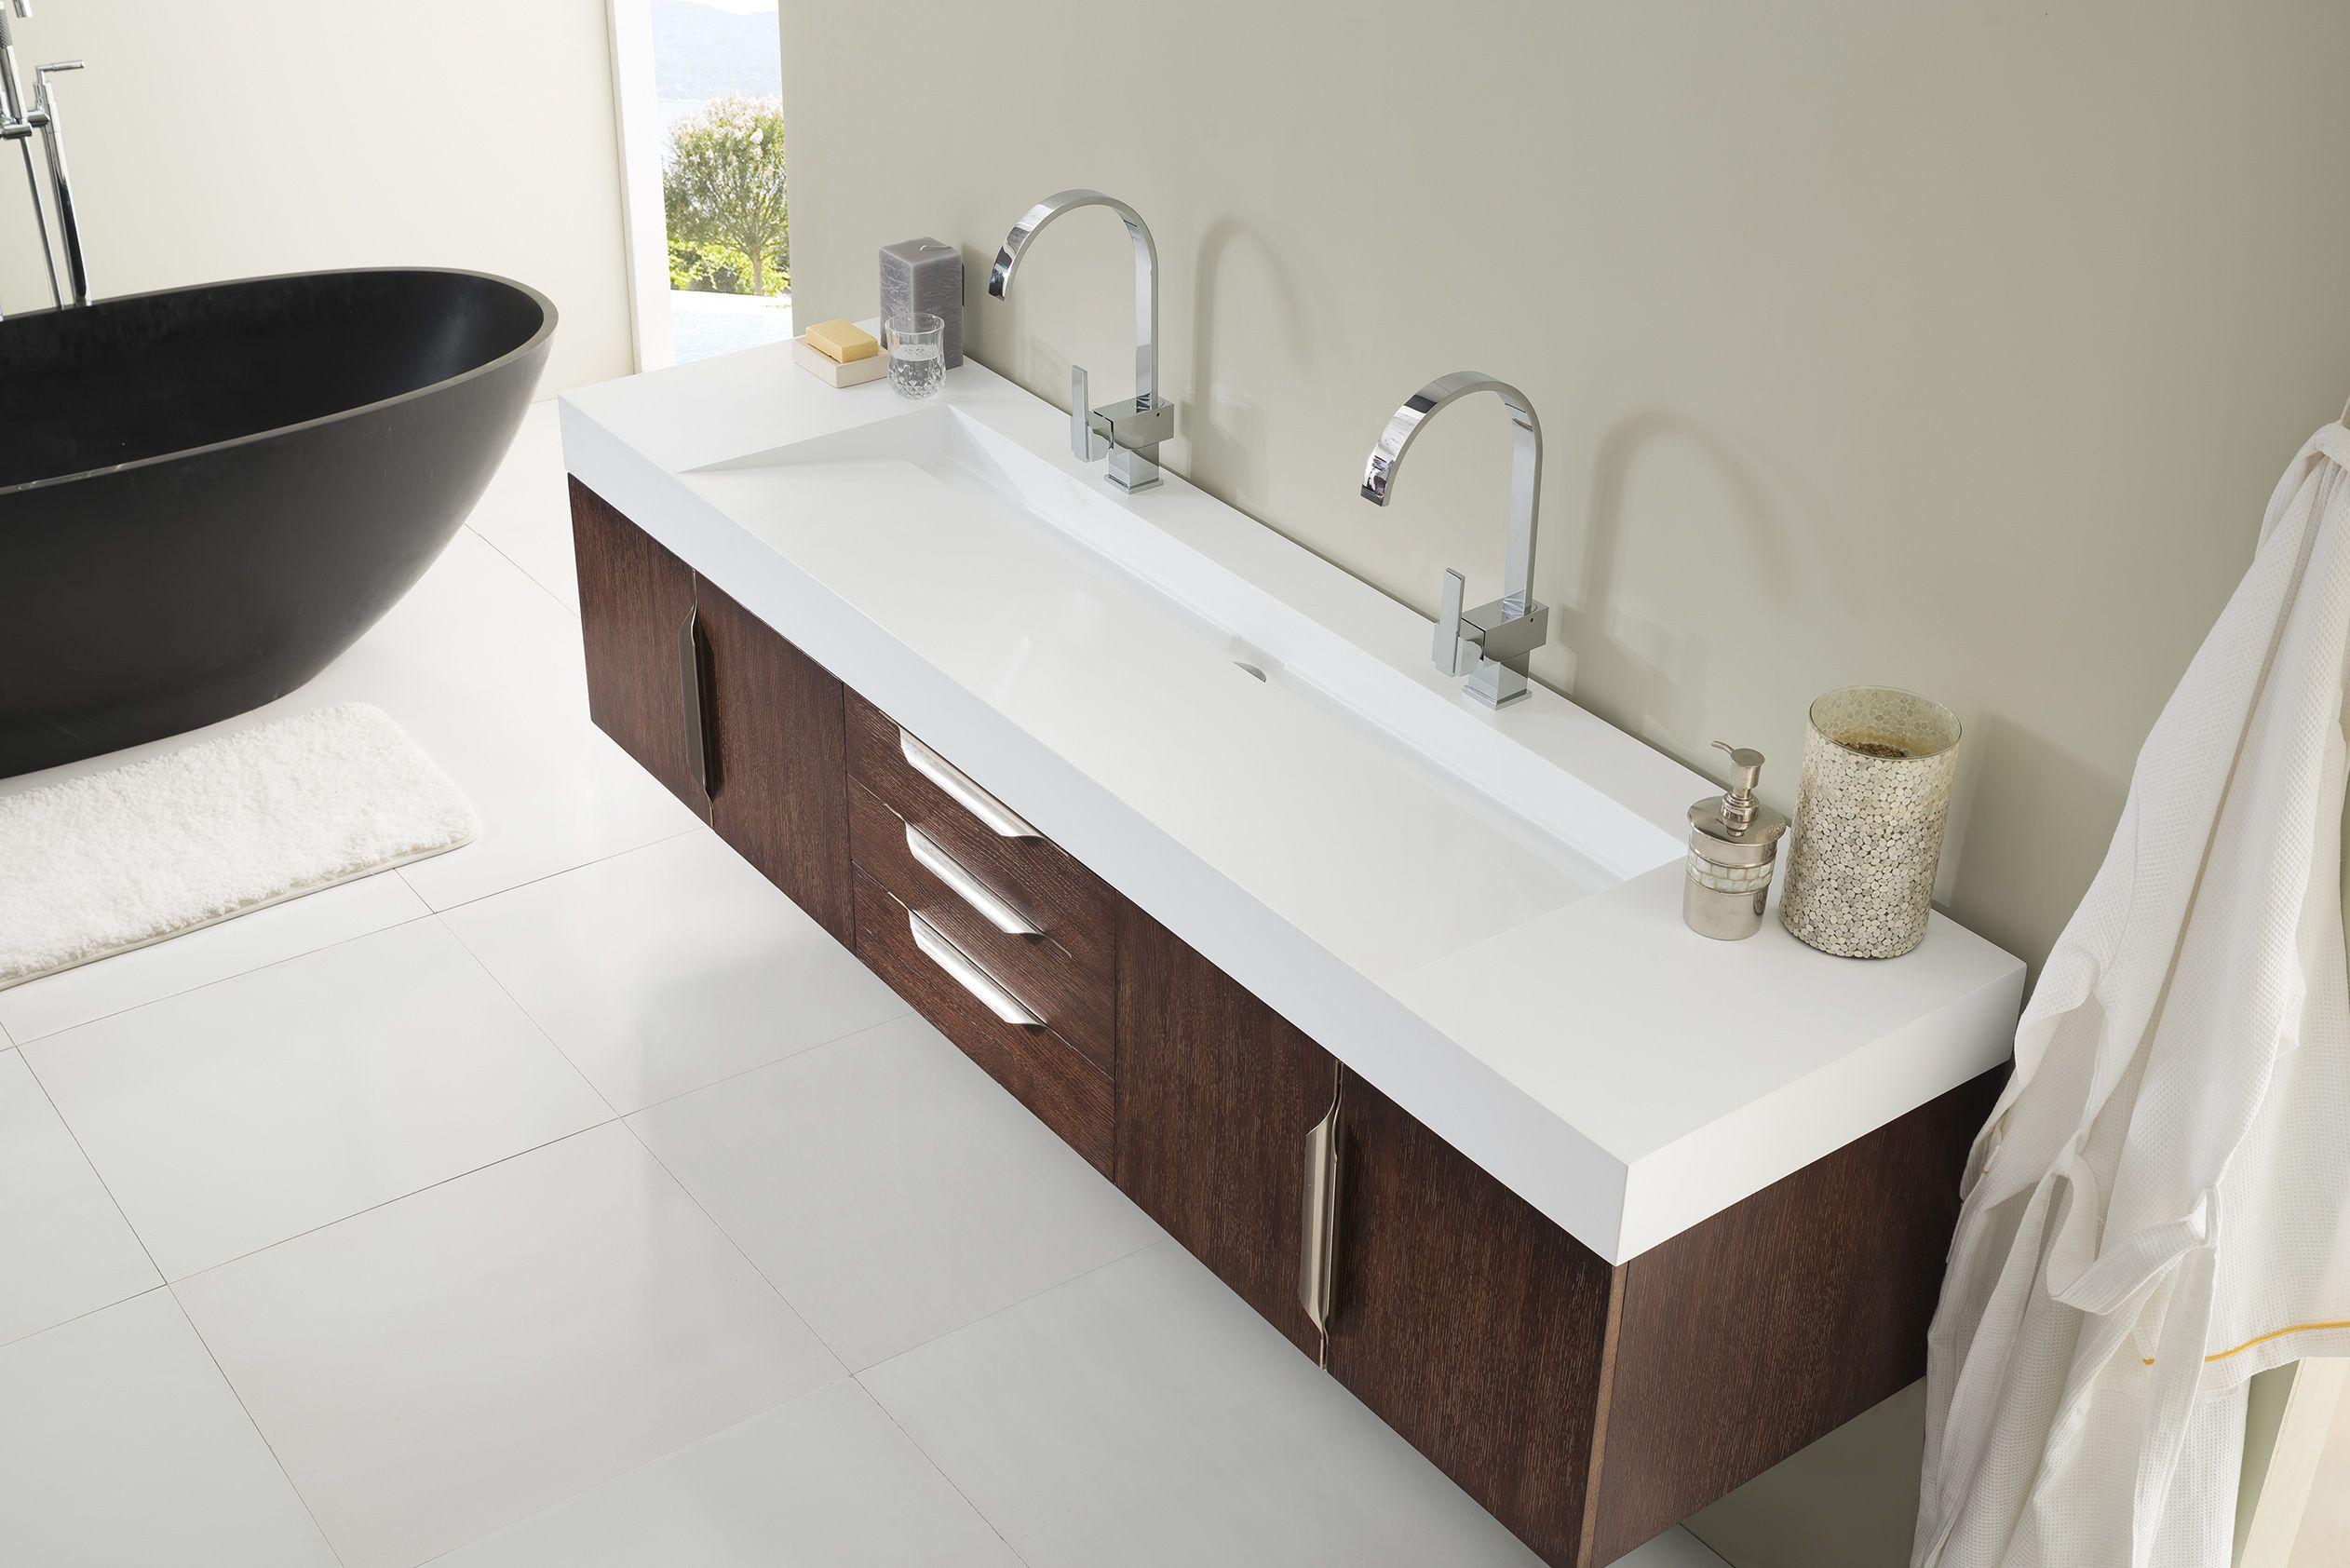 Mercer Island 72 Double Sink Floating Bathroom Vanity Cabinet